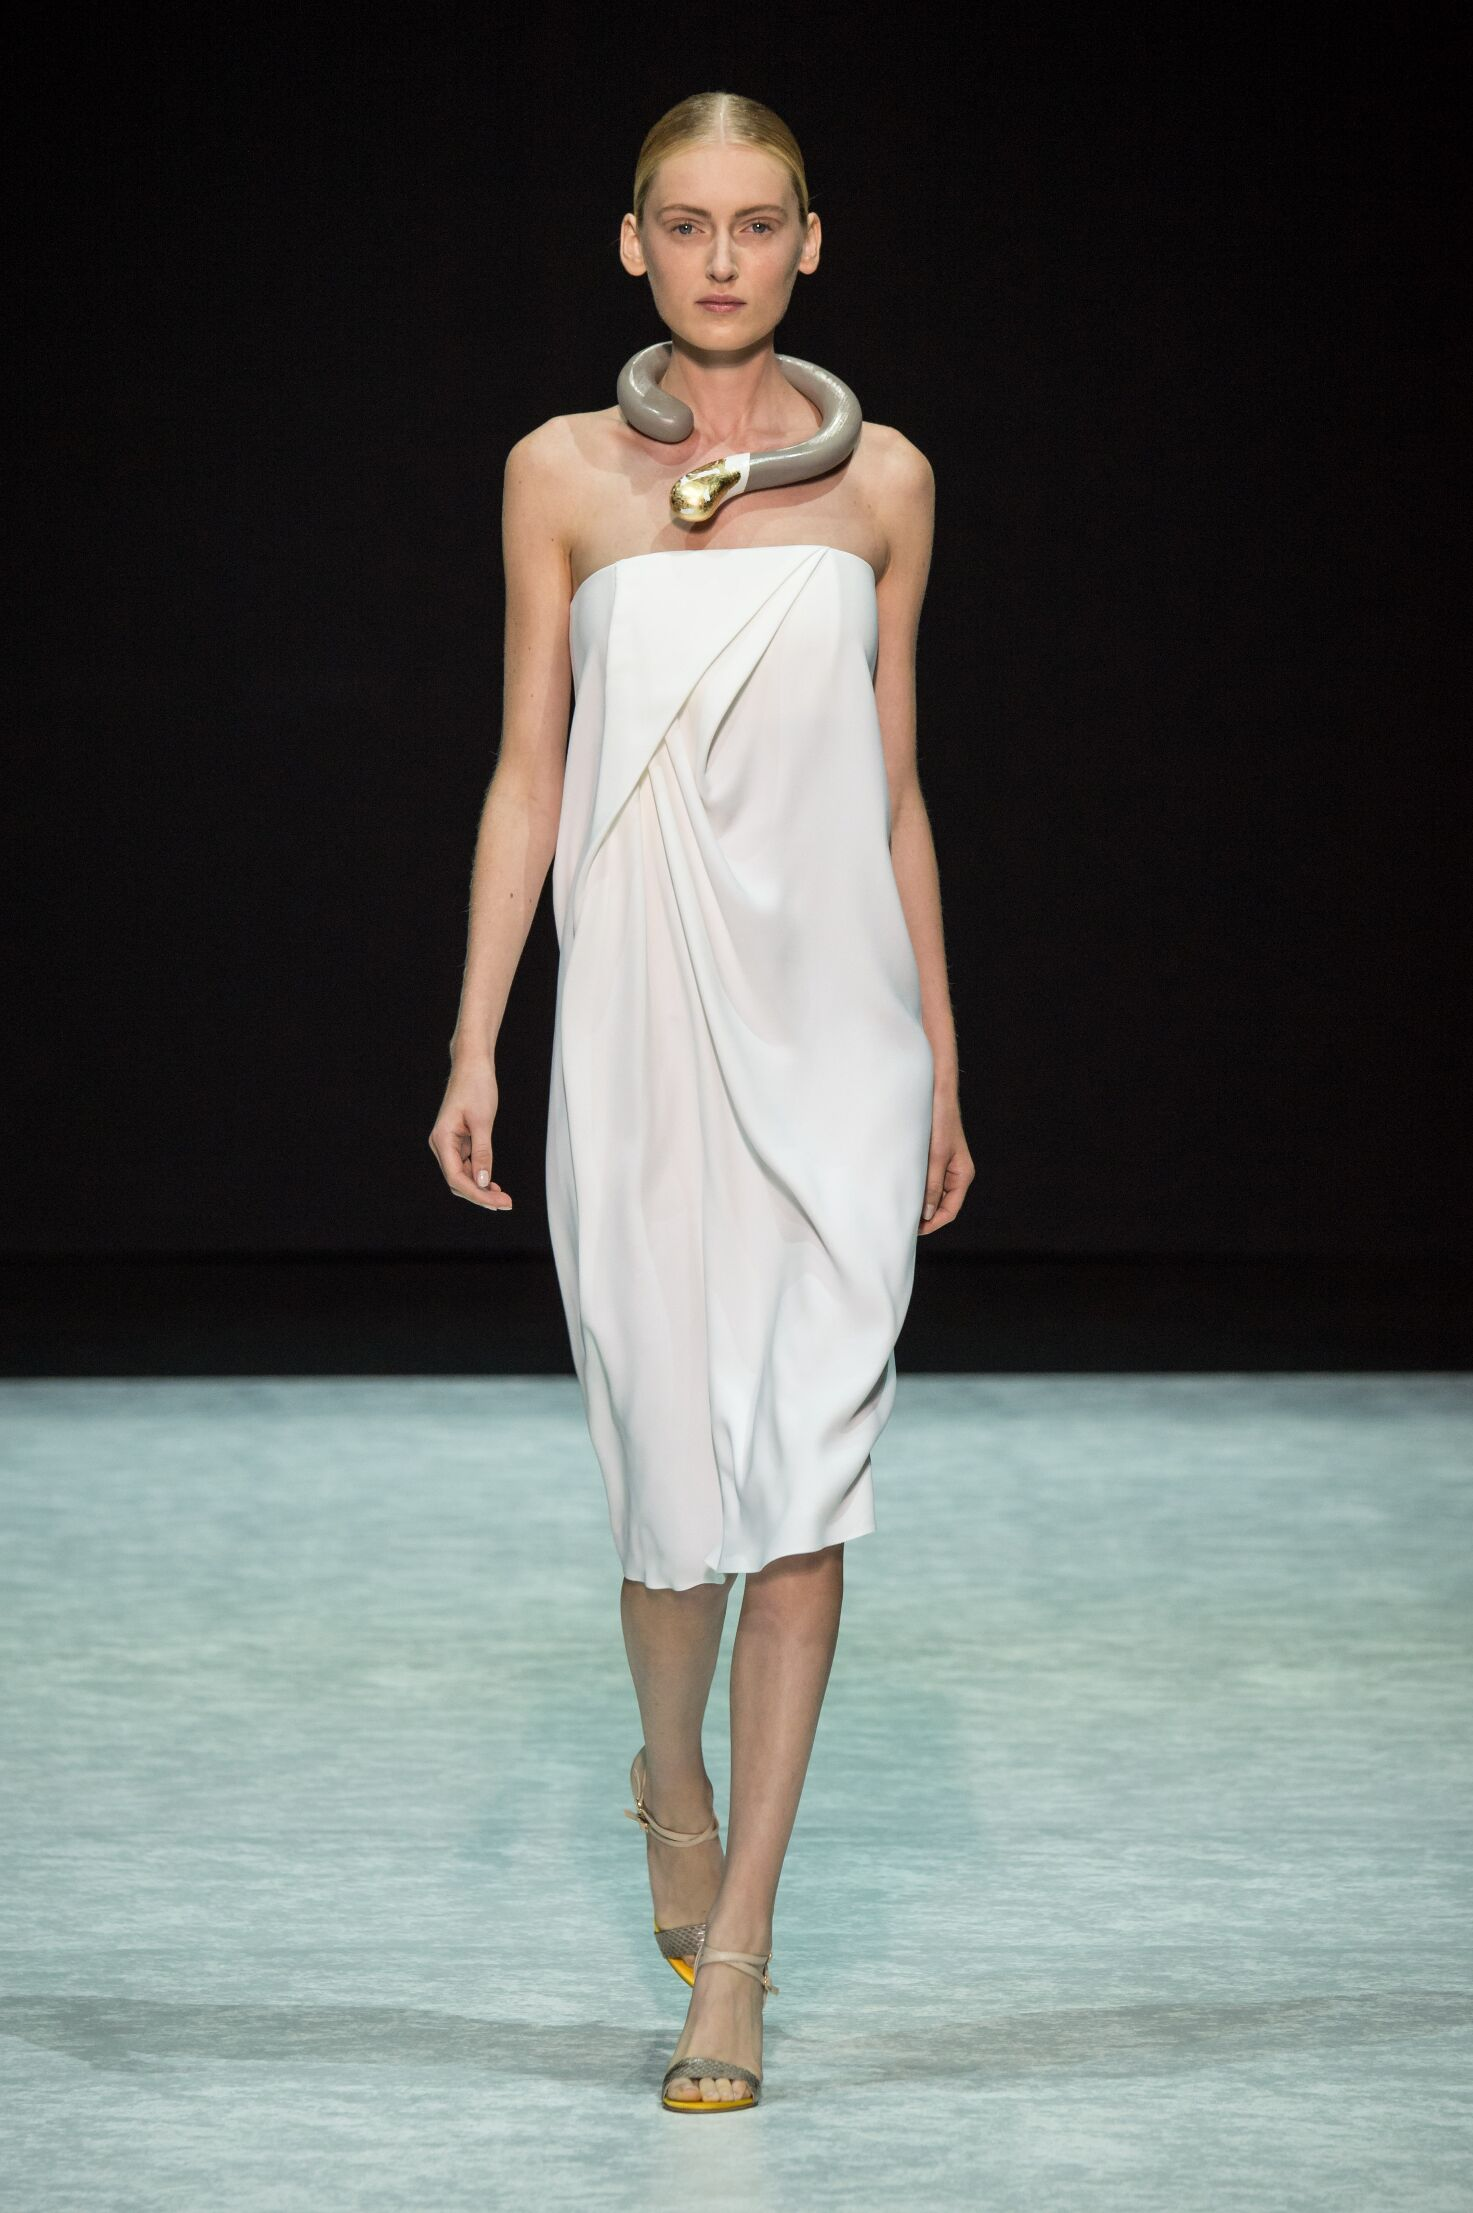 Fashion Model Angelos Bratis Catwalk